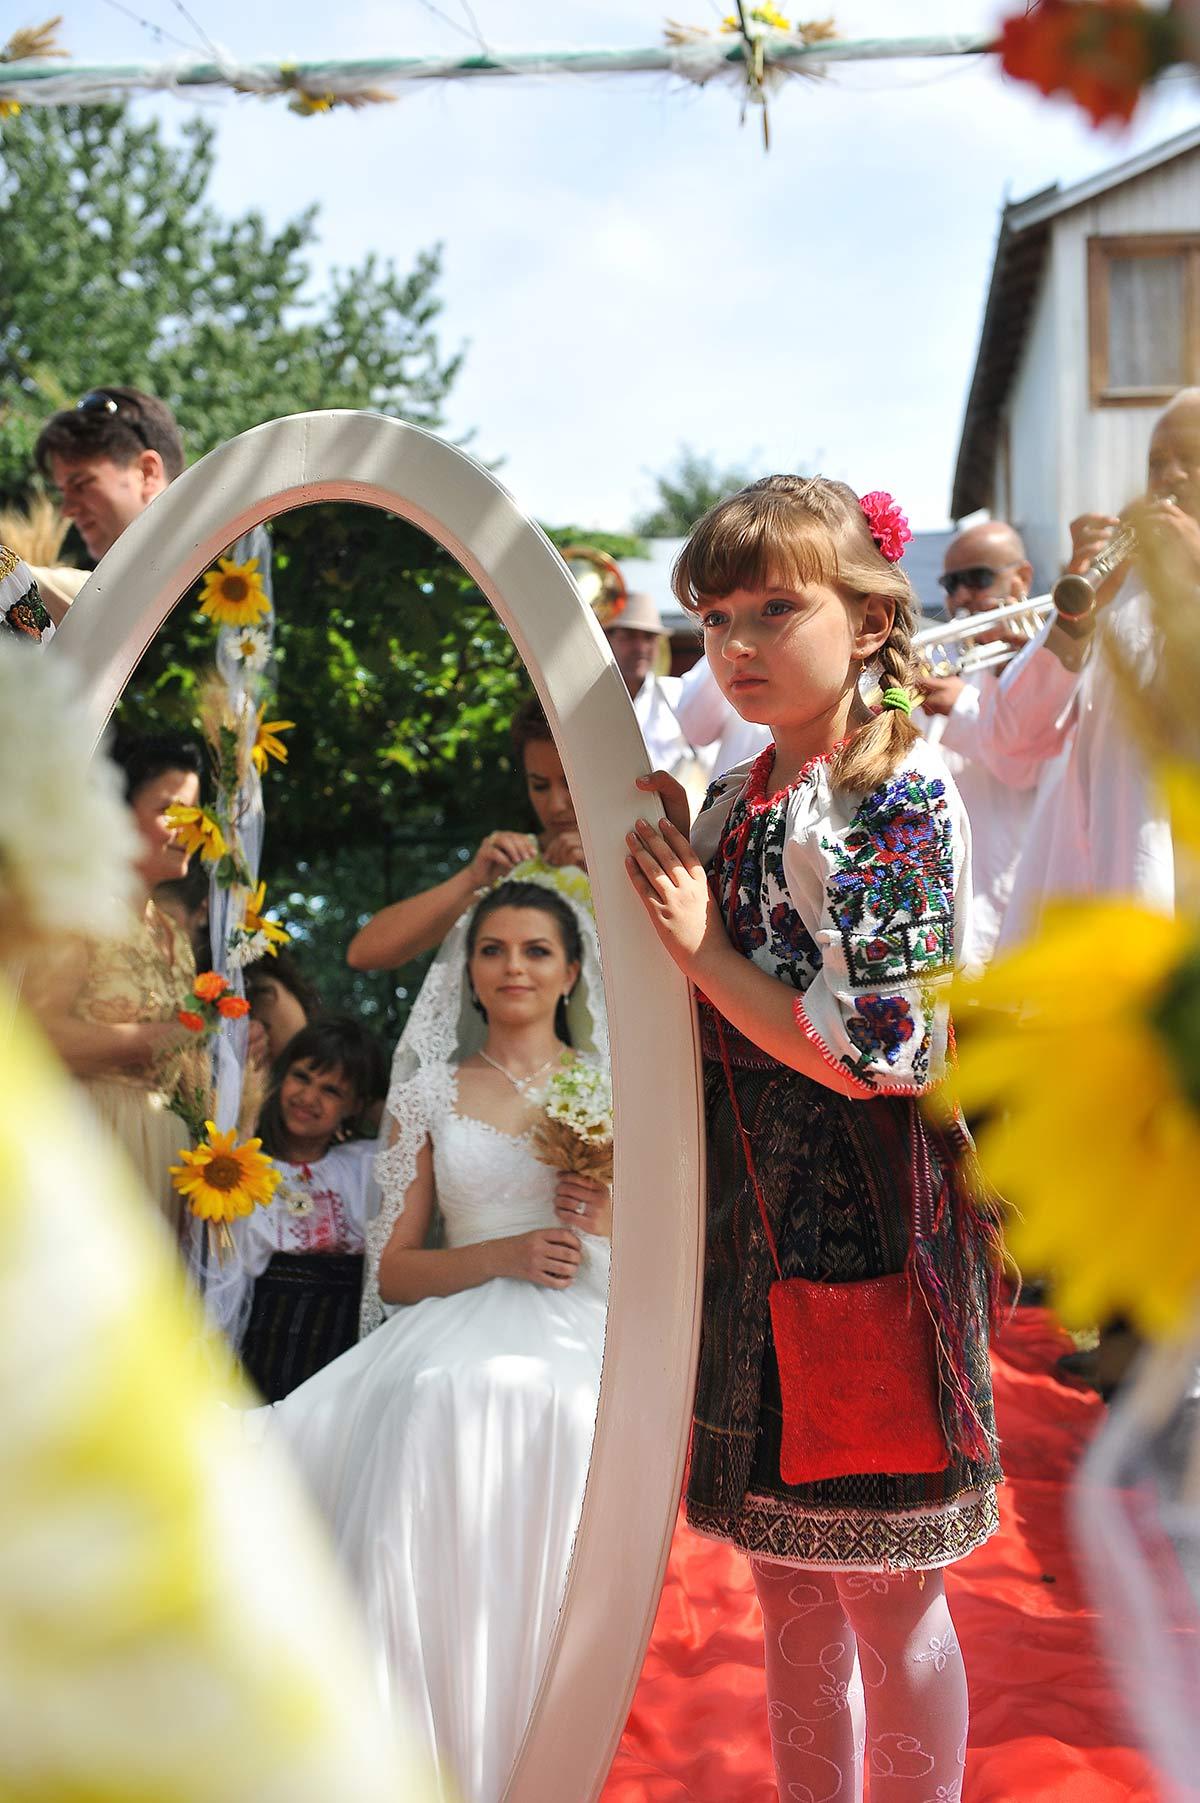 Fotografi nunta Targu Neamt, Fotograf profesionist Targu Neamt - Fotografi nunta Targu Neamt - Poze nunta la Cetatea Neamtului - sedinta foto de nunta | Fotograf nunta Targu Neamt, Nunti Targu Neamt